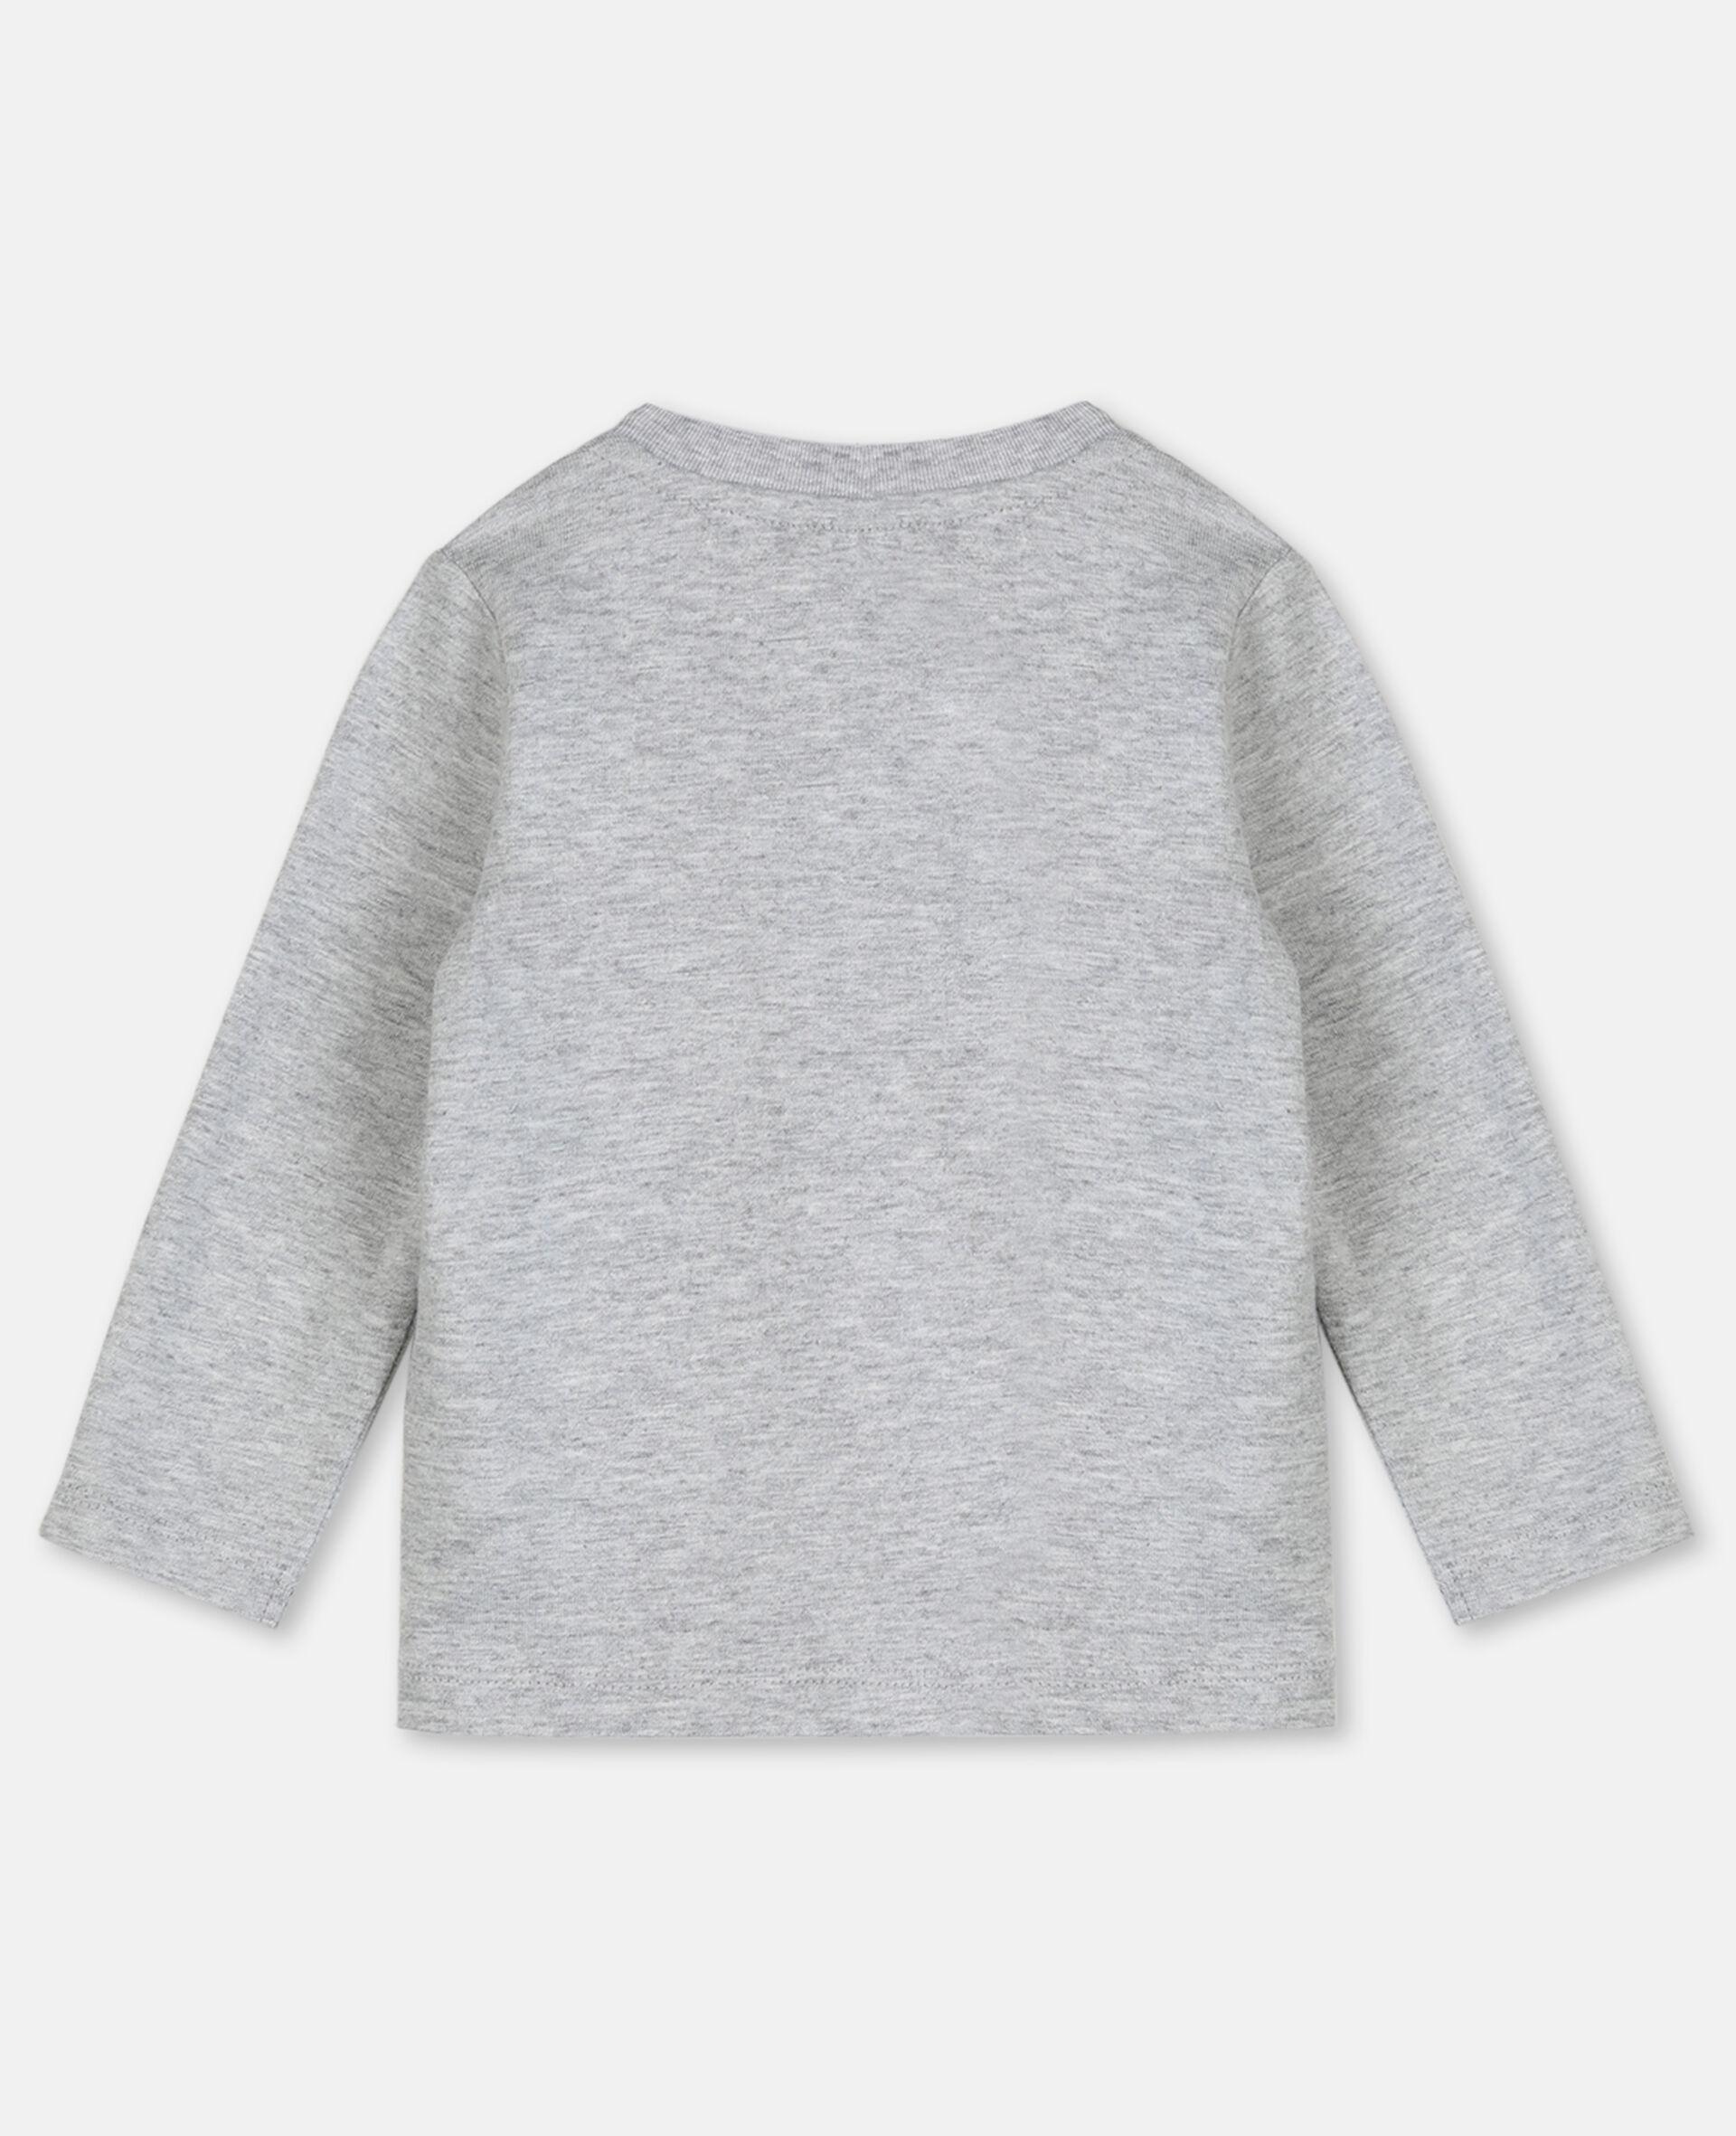 T-Shirt aus Baumwolle mit Fernglas-Print -Grau-large image number 3